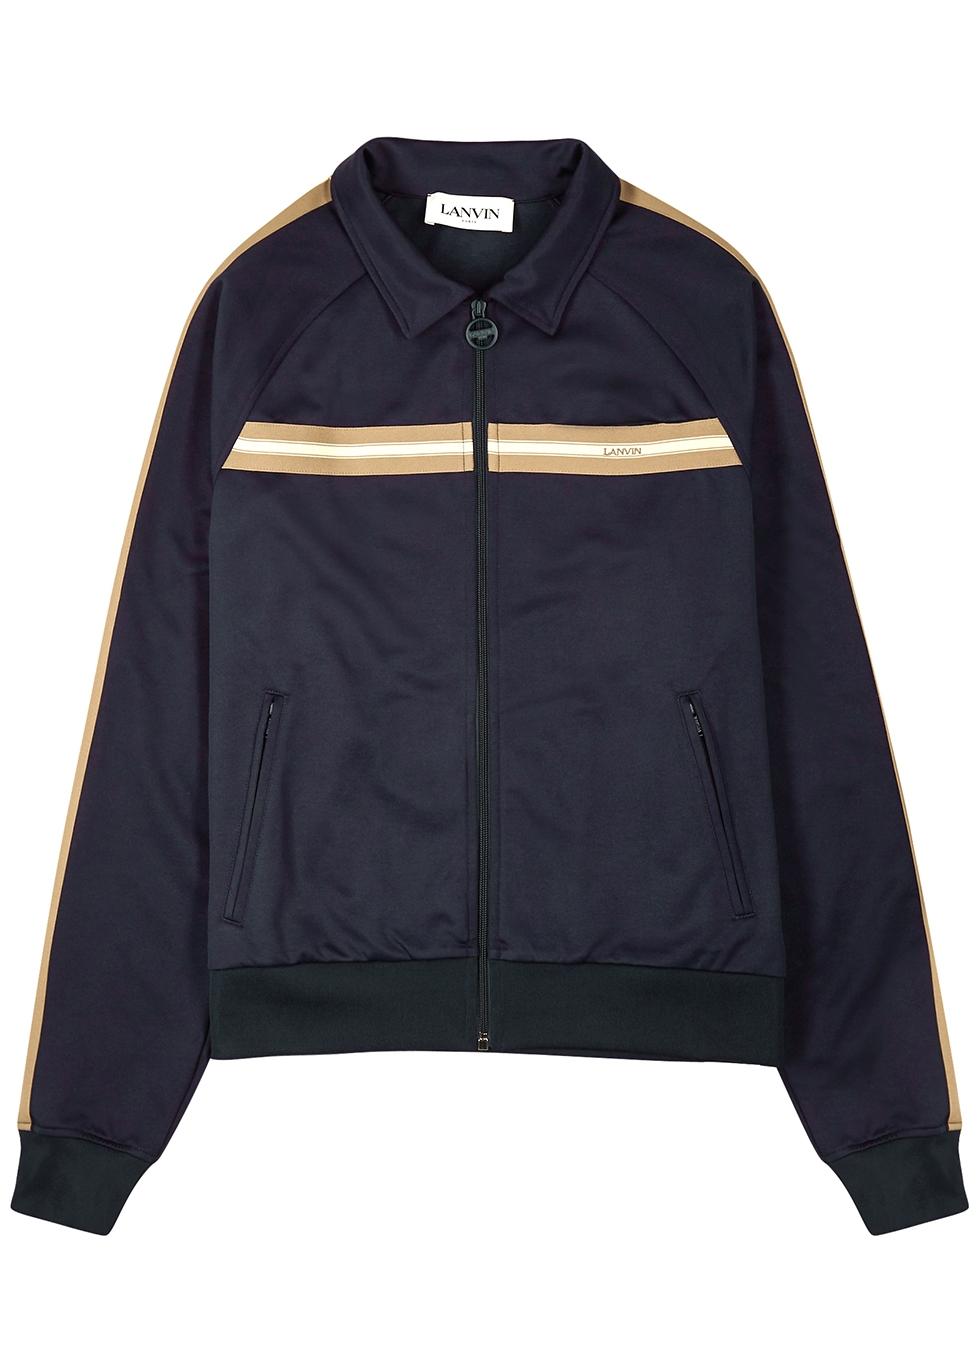 Navy jersey track jacket